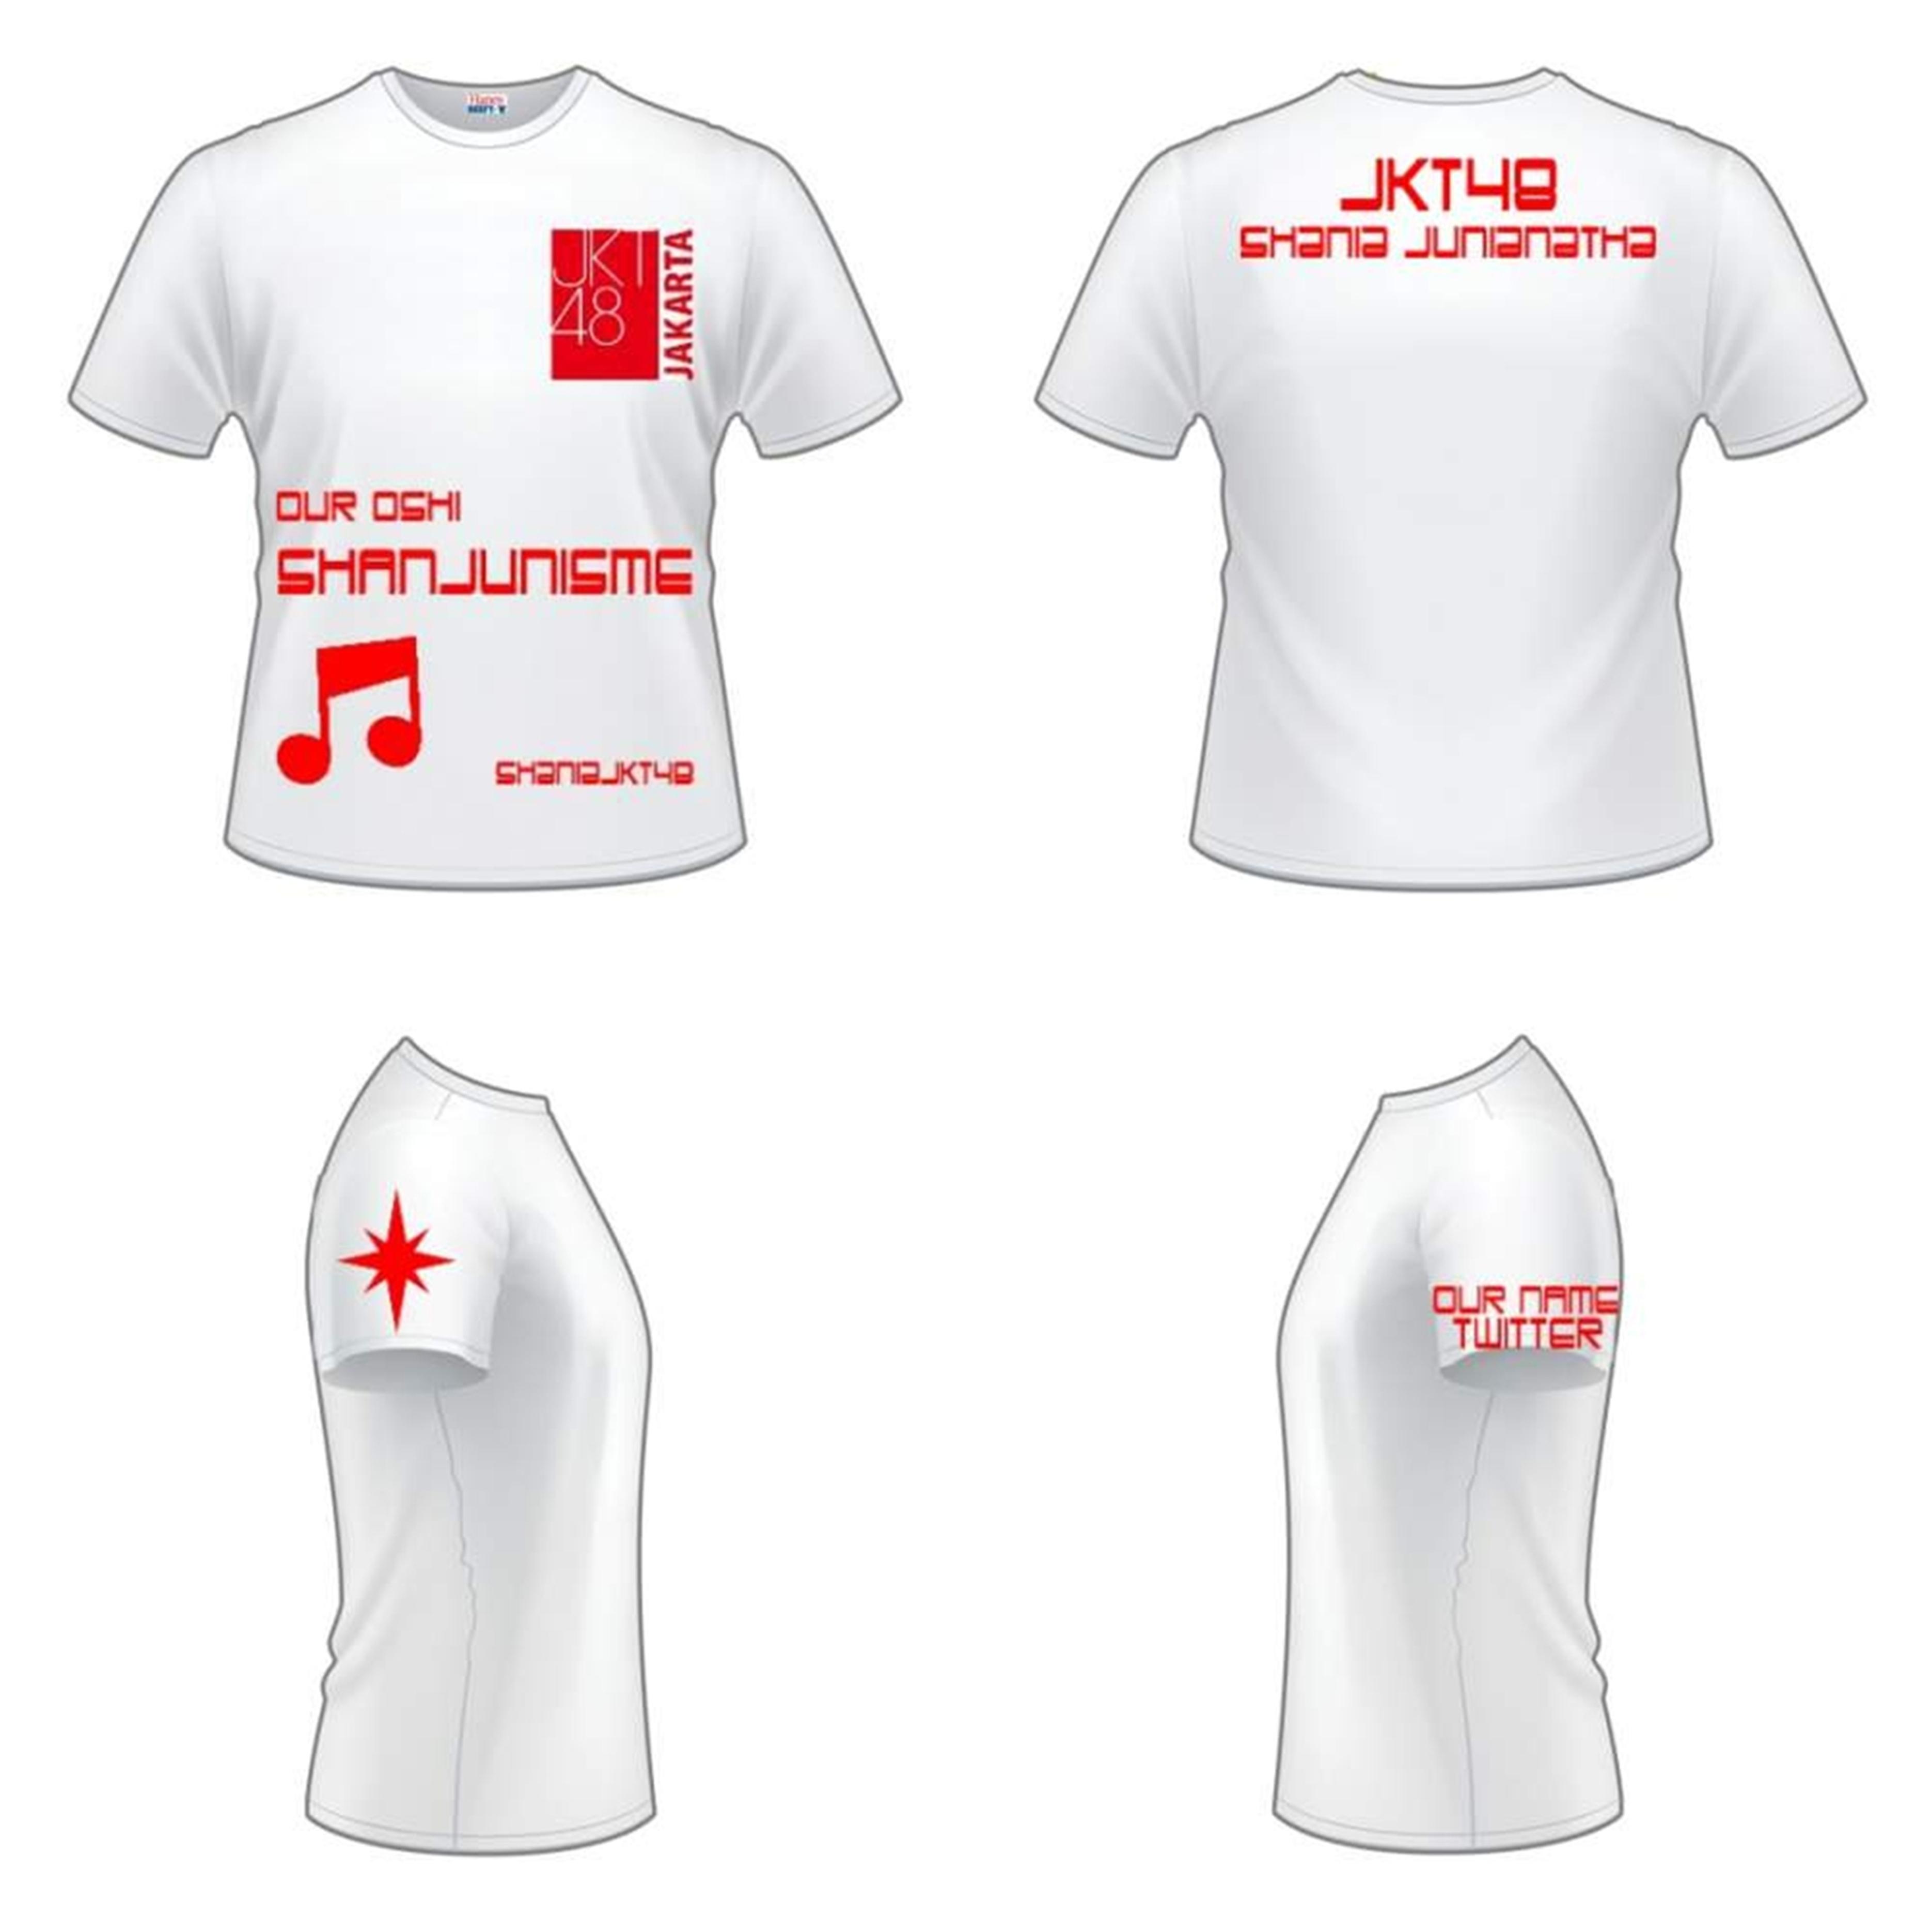 Desain t shirt jkt48 - Iklan